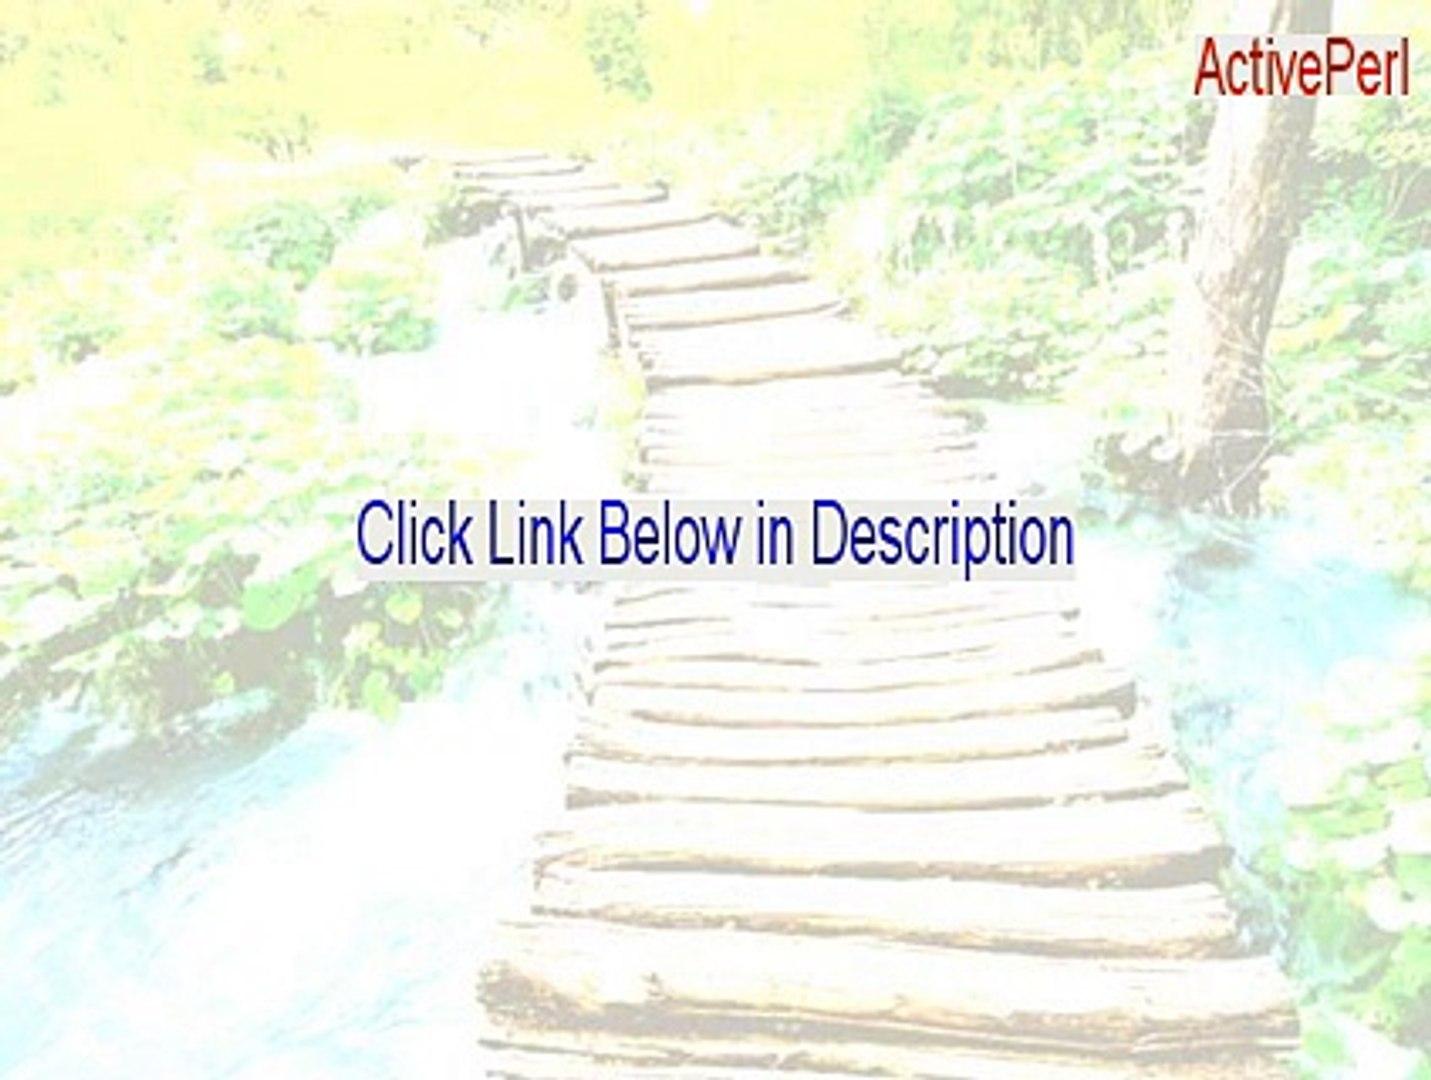 ActivePerl (Windows) Crack (activeperl 5 16 download 2015